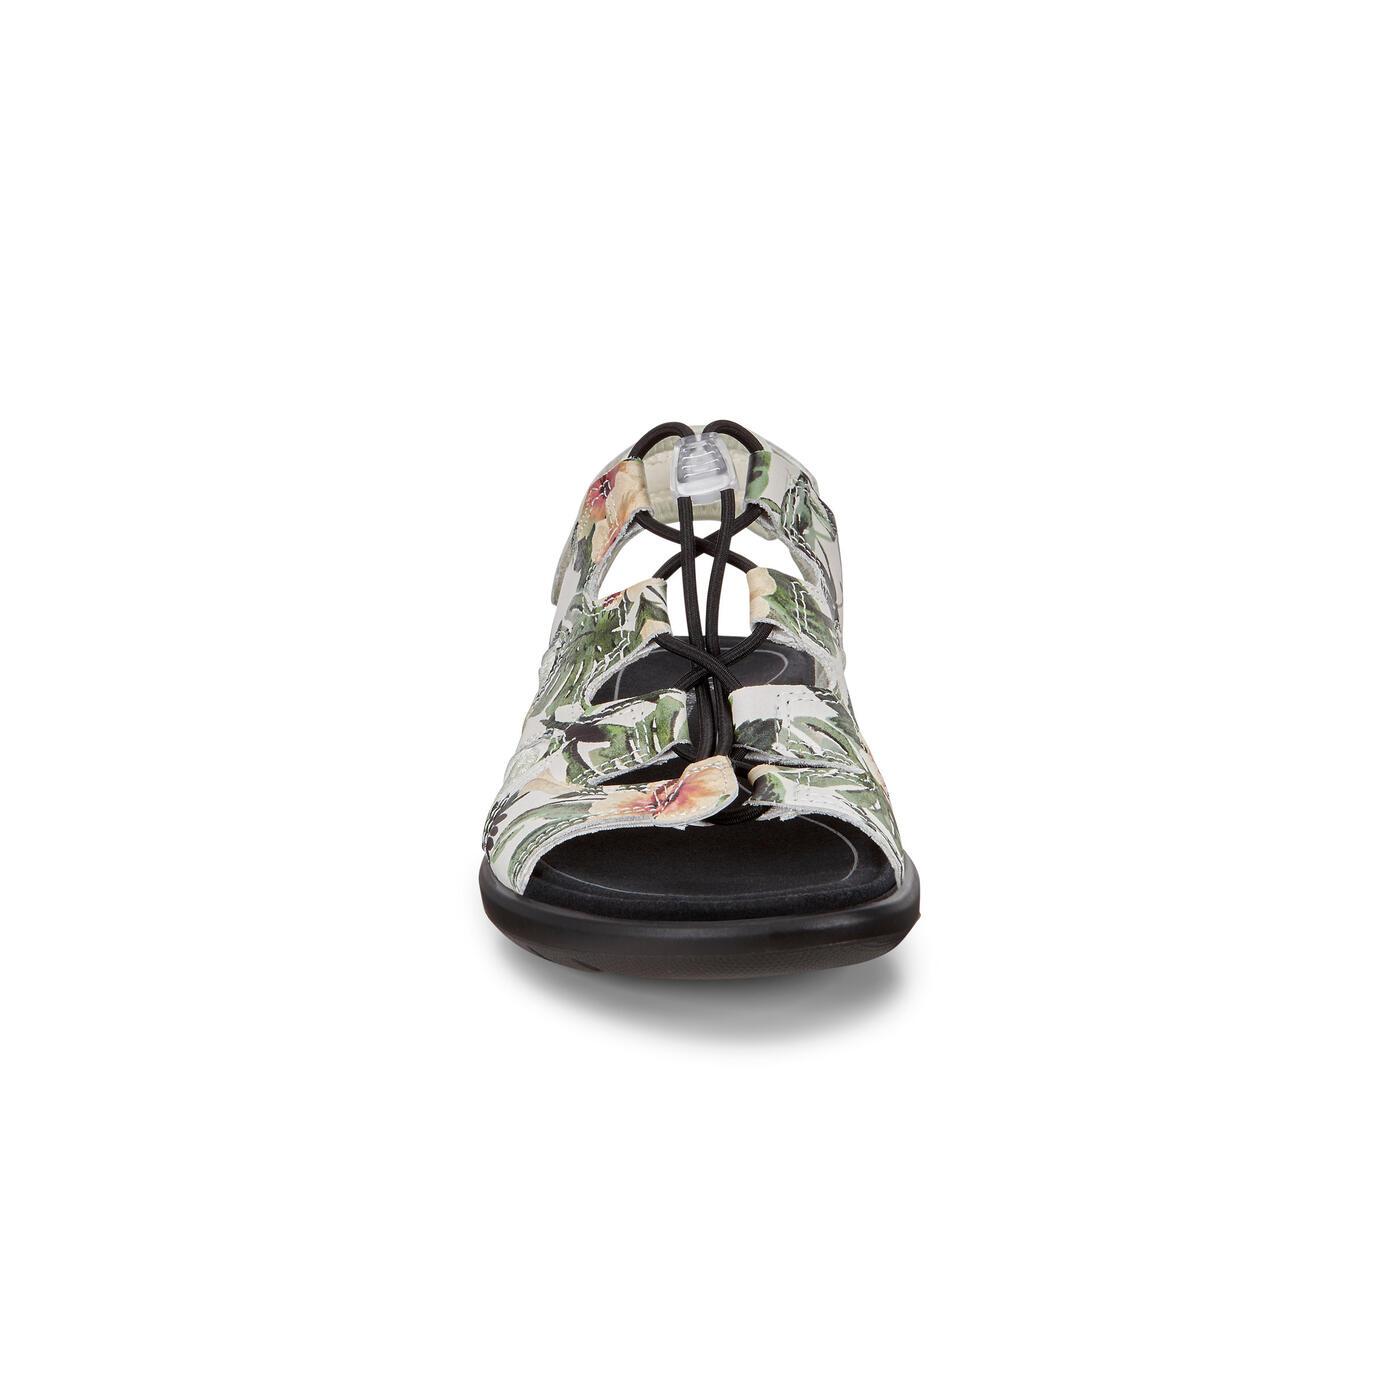 ECCO Soft 5 Toggle Sandal